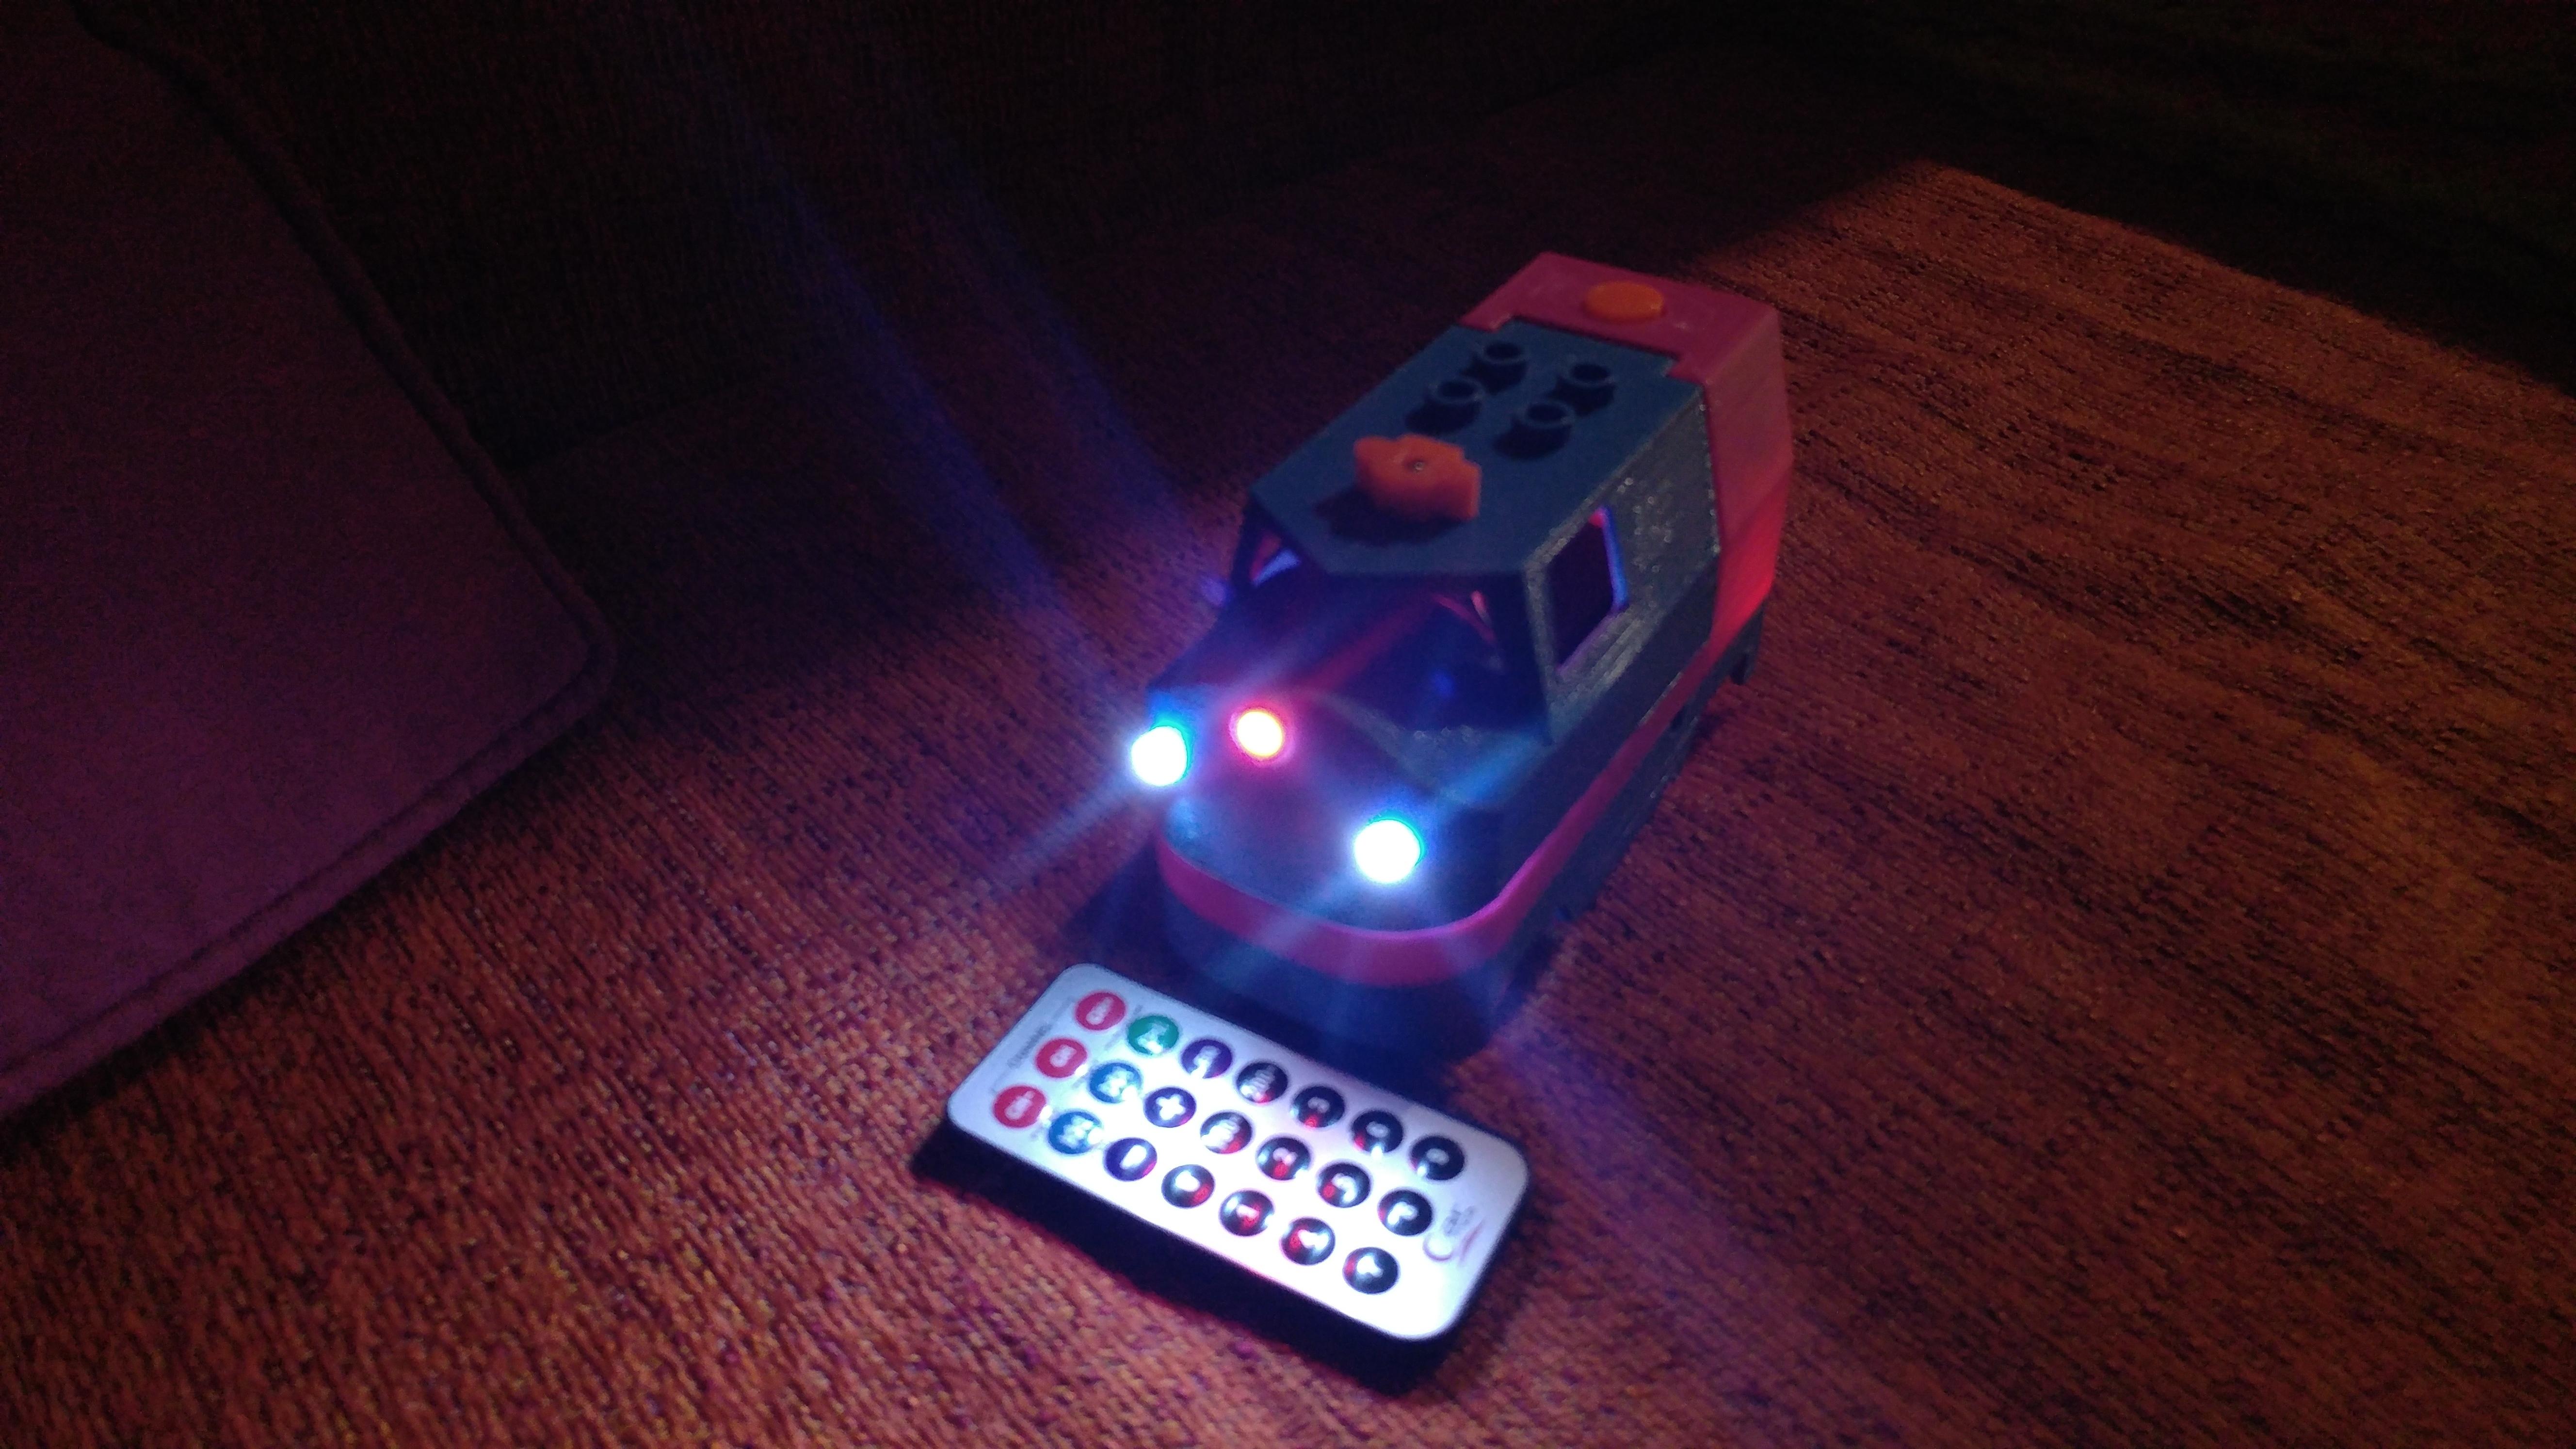 20181222_211458.jpg Télécharger fichier STL gratuit Tren Lego Duplo Motorizado controlado por Infrarojos • Objet à imprimer en 3D, celtarra12